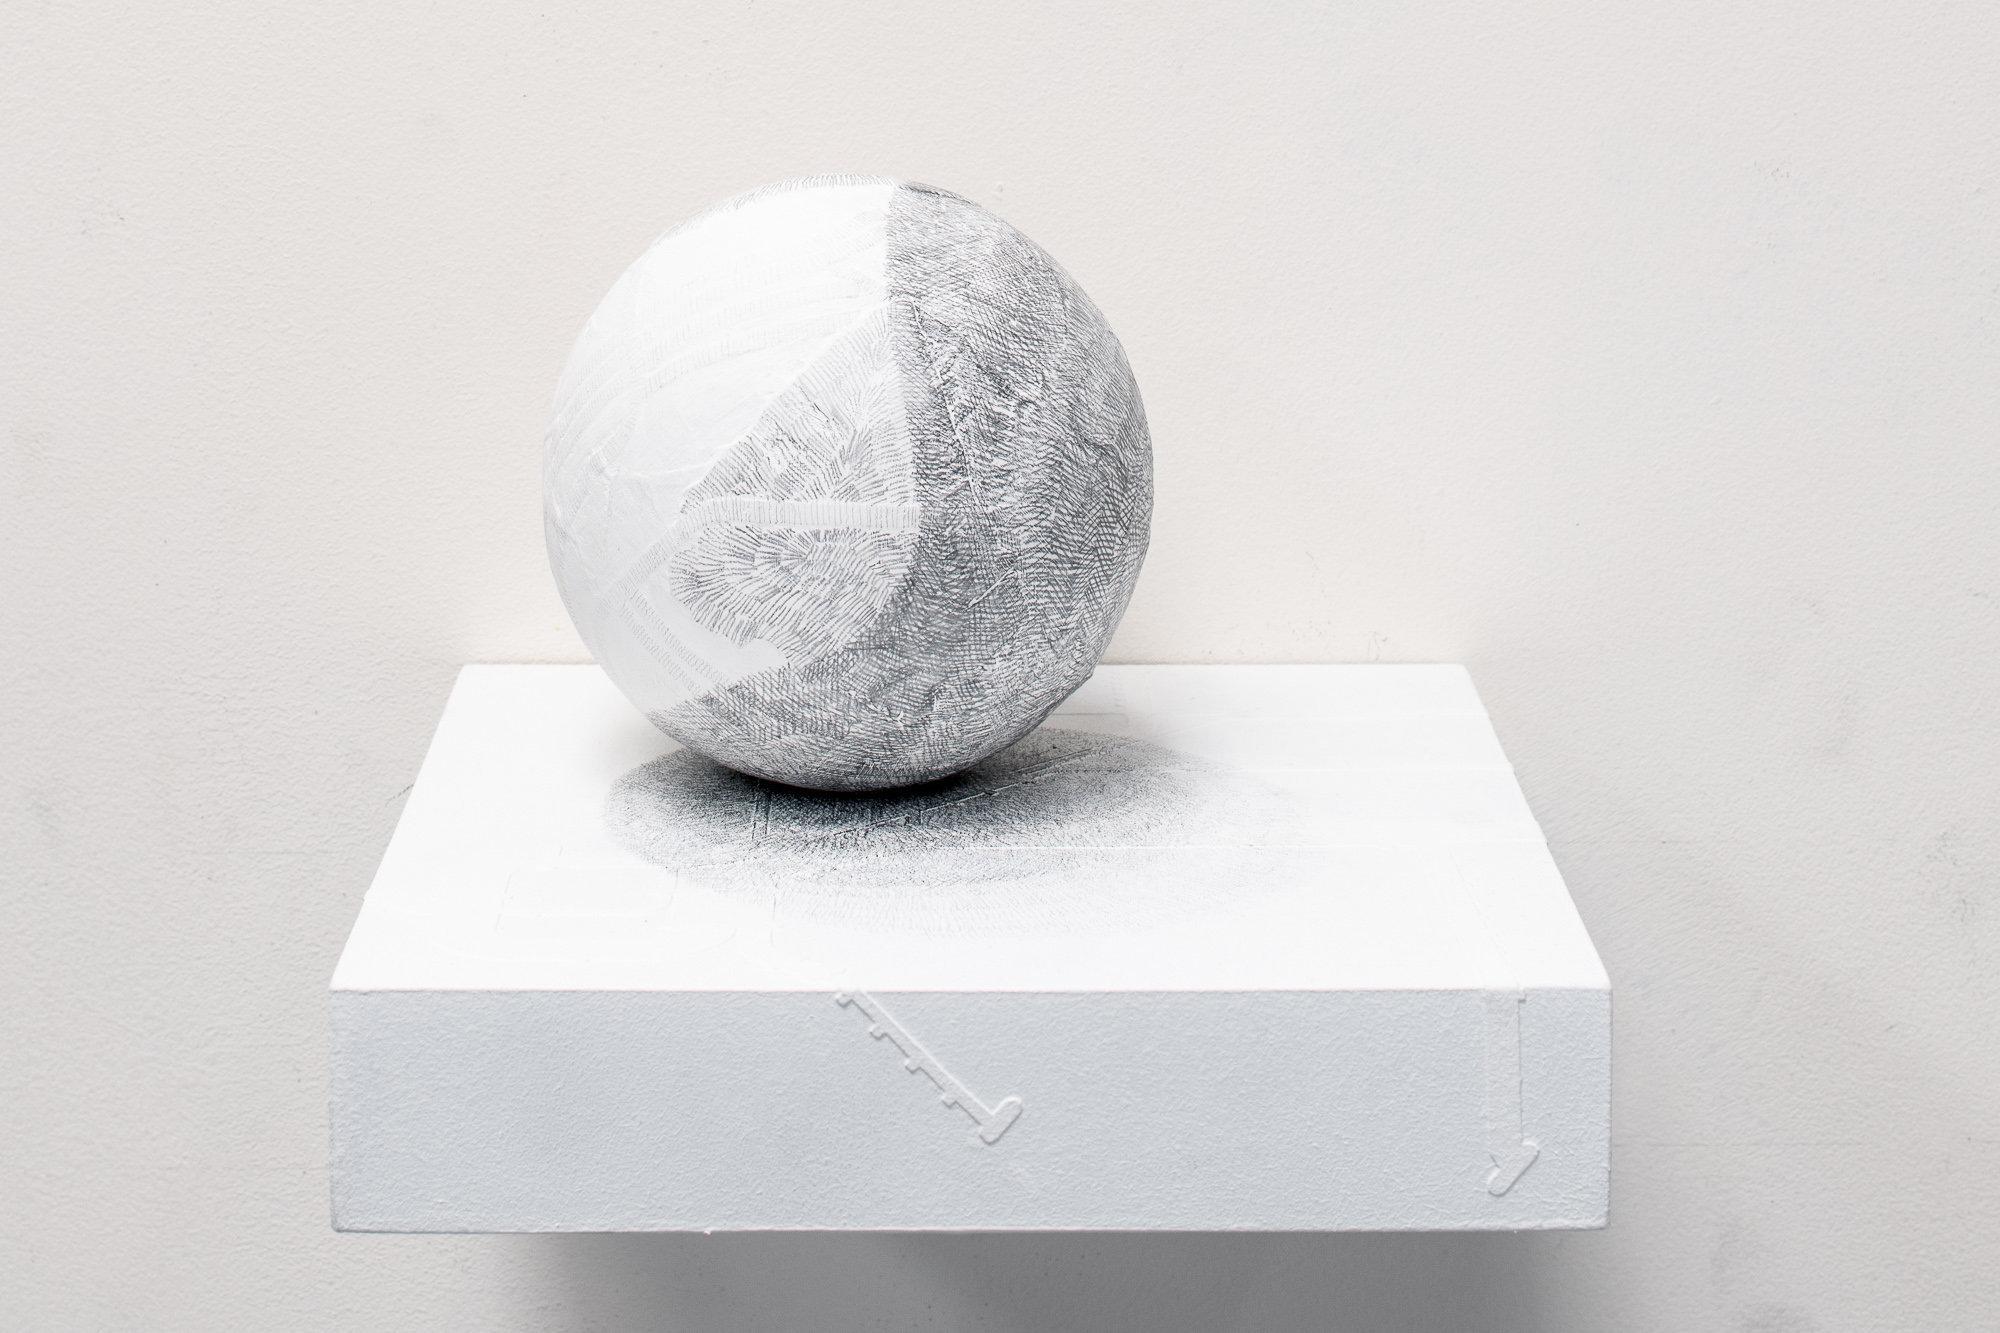 Residual #18 Pocket Globe